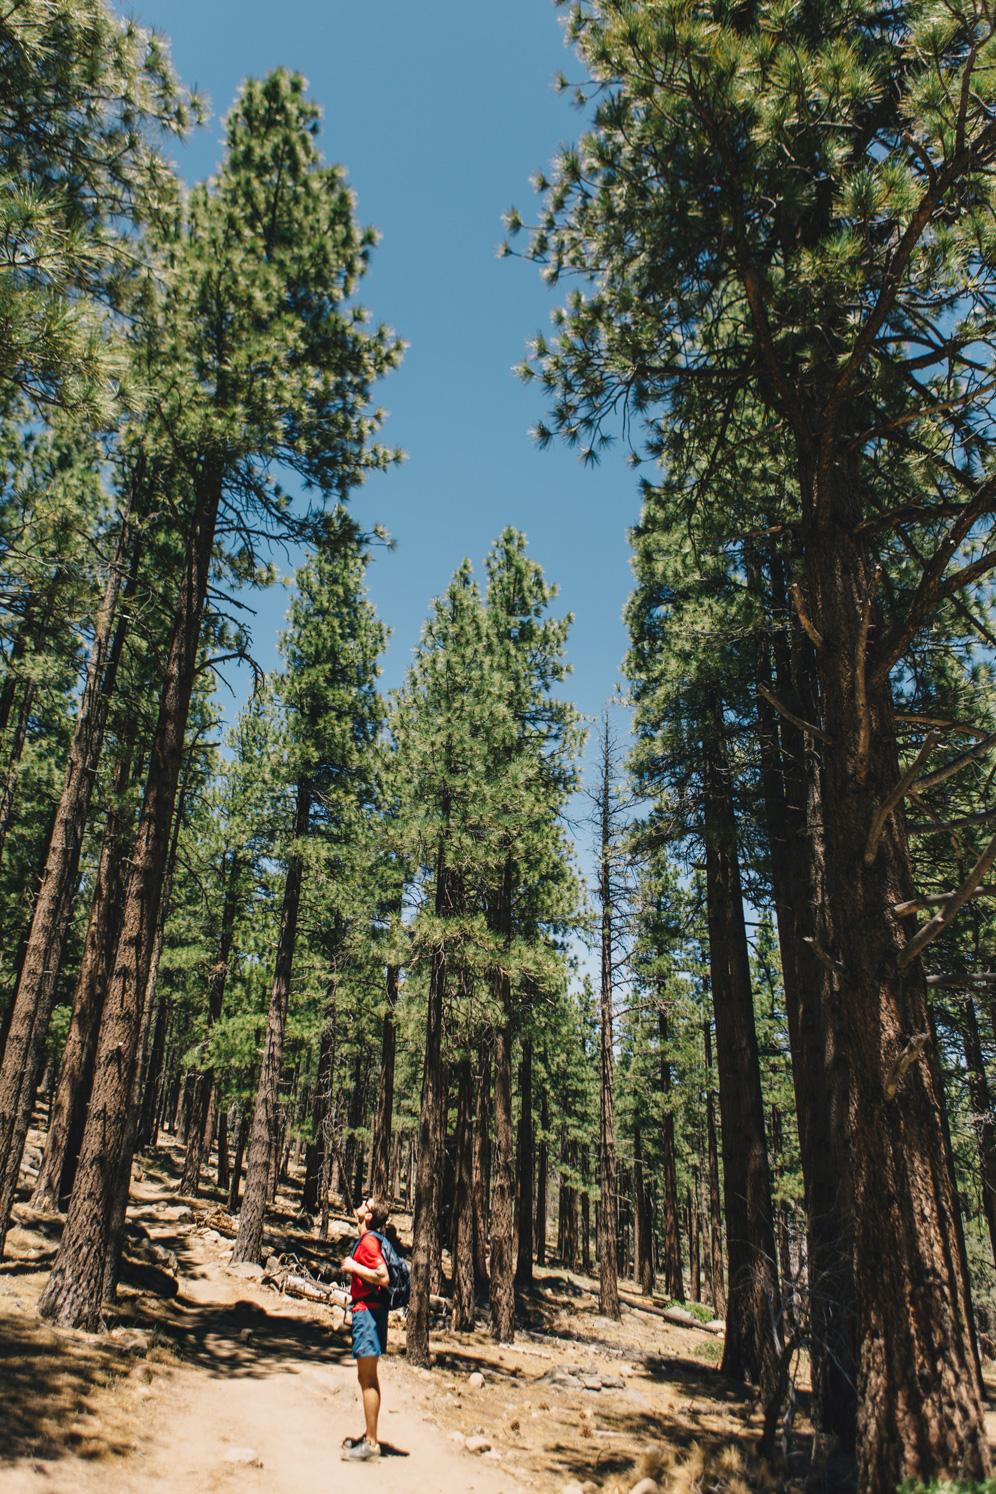 CindyGiovagnoli_Galena_Creek_Visitors_Center_hike_Reno_Tahoe_Nevada_outdoor_activities-009.jpg